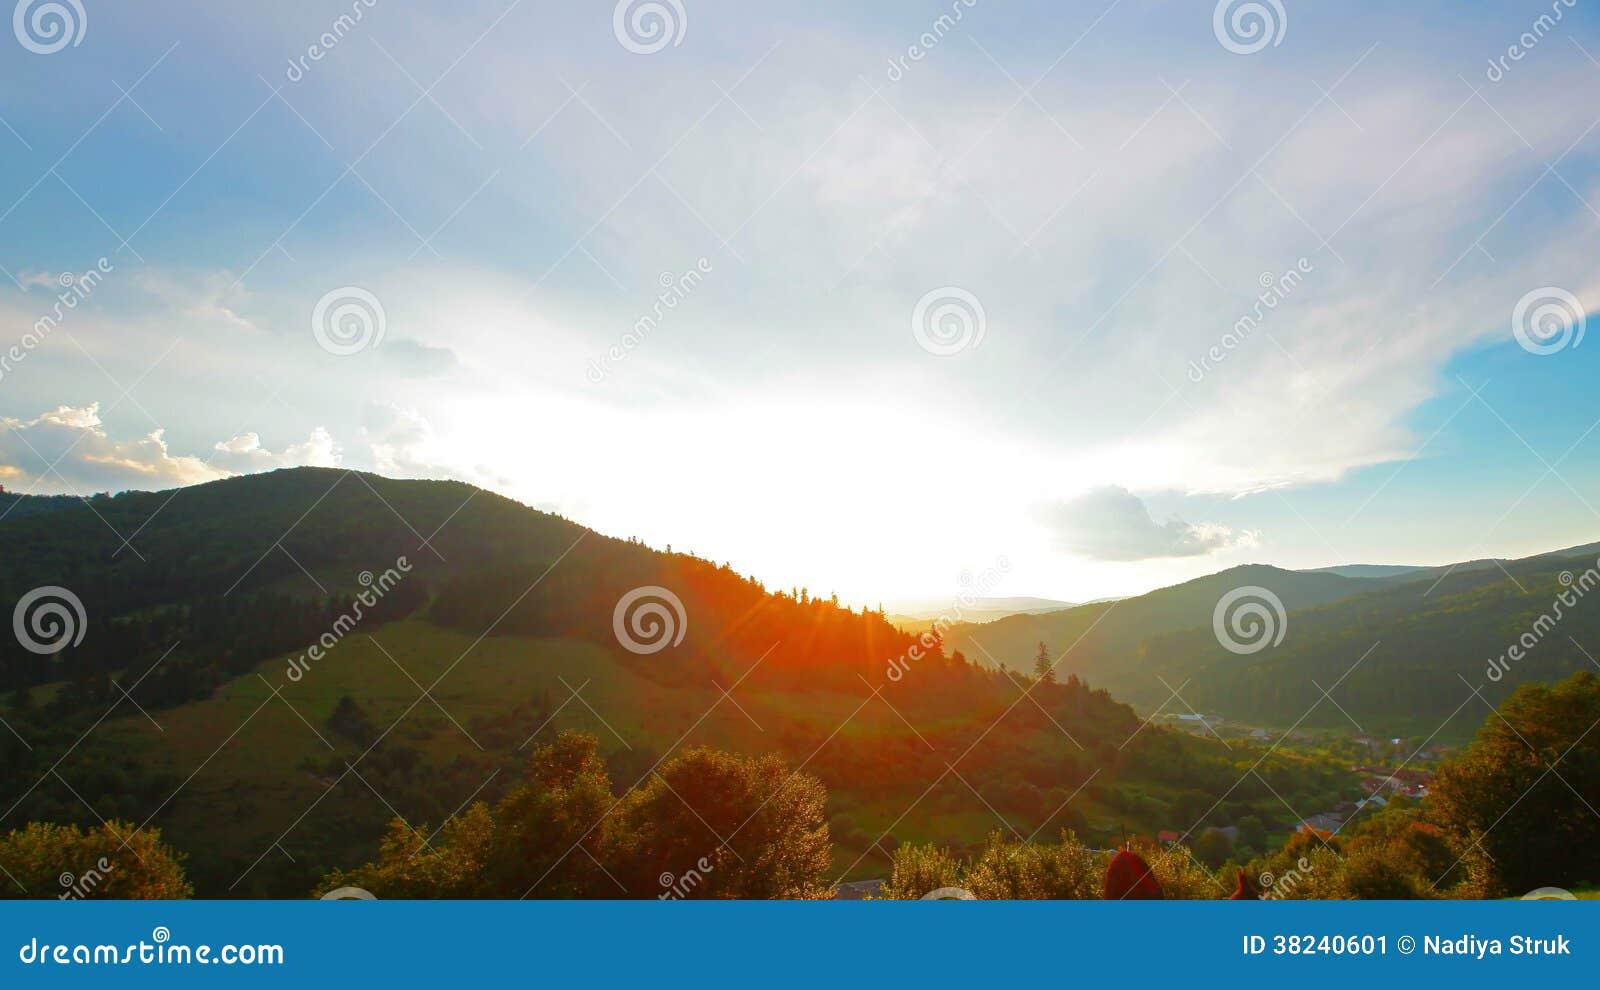 Paesaggio Della Montagna 4k Hd Pieno 4096x2304 Stock Footage